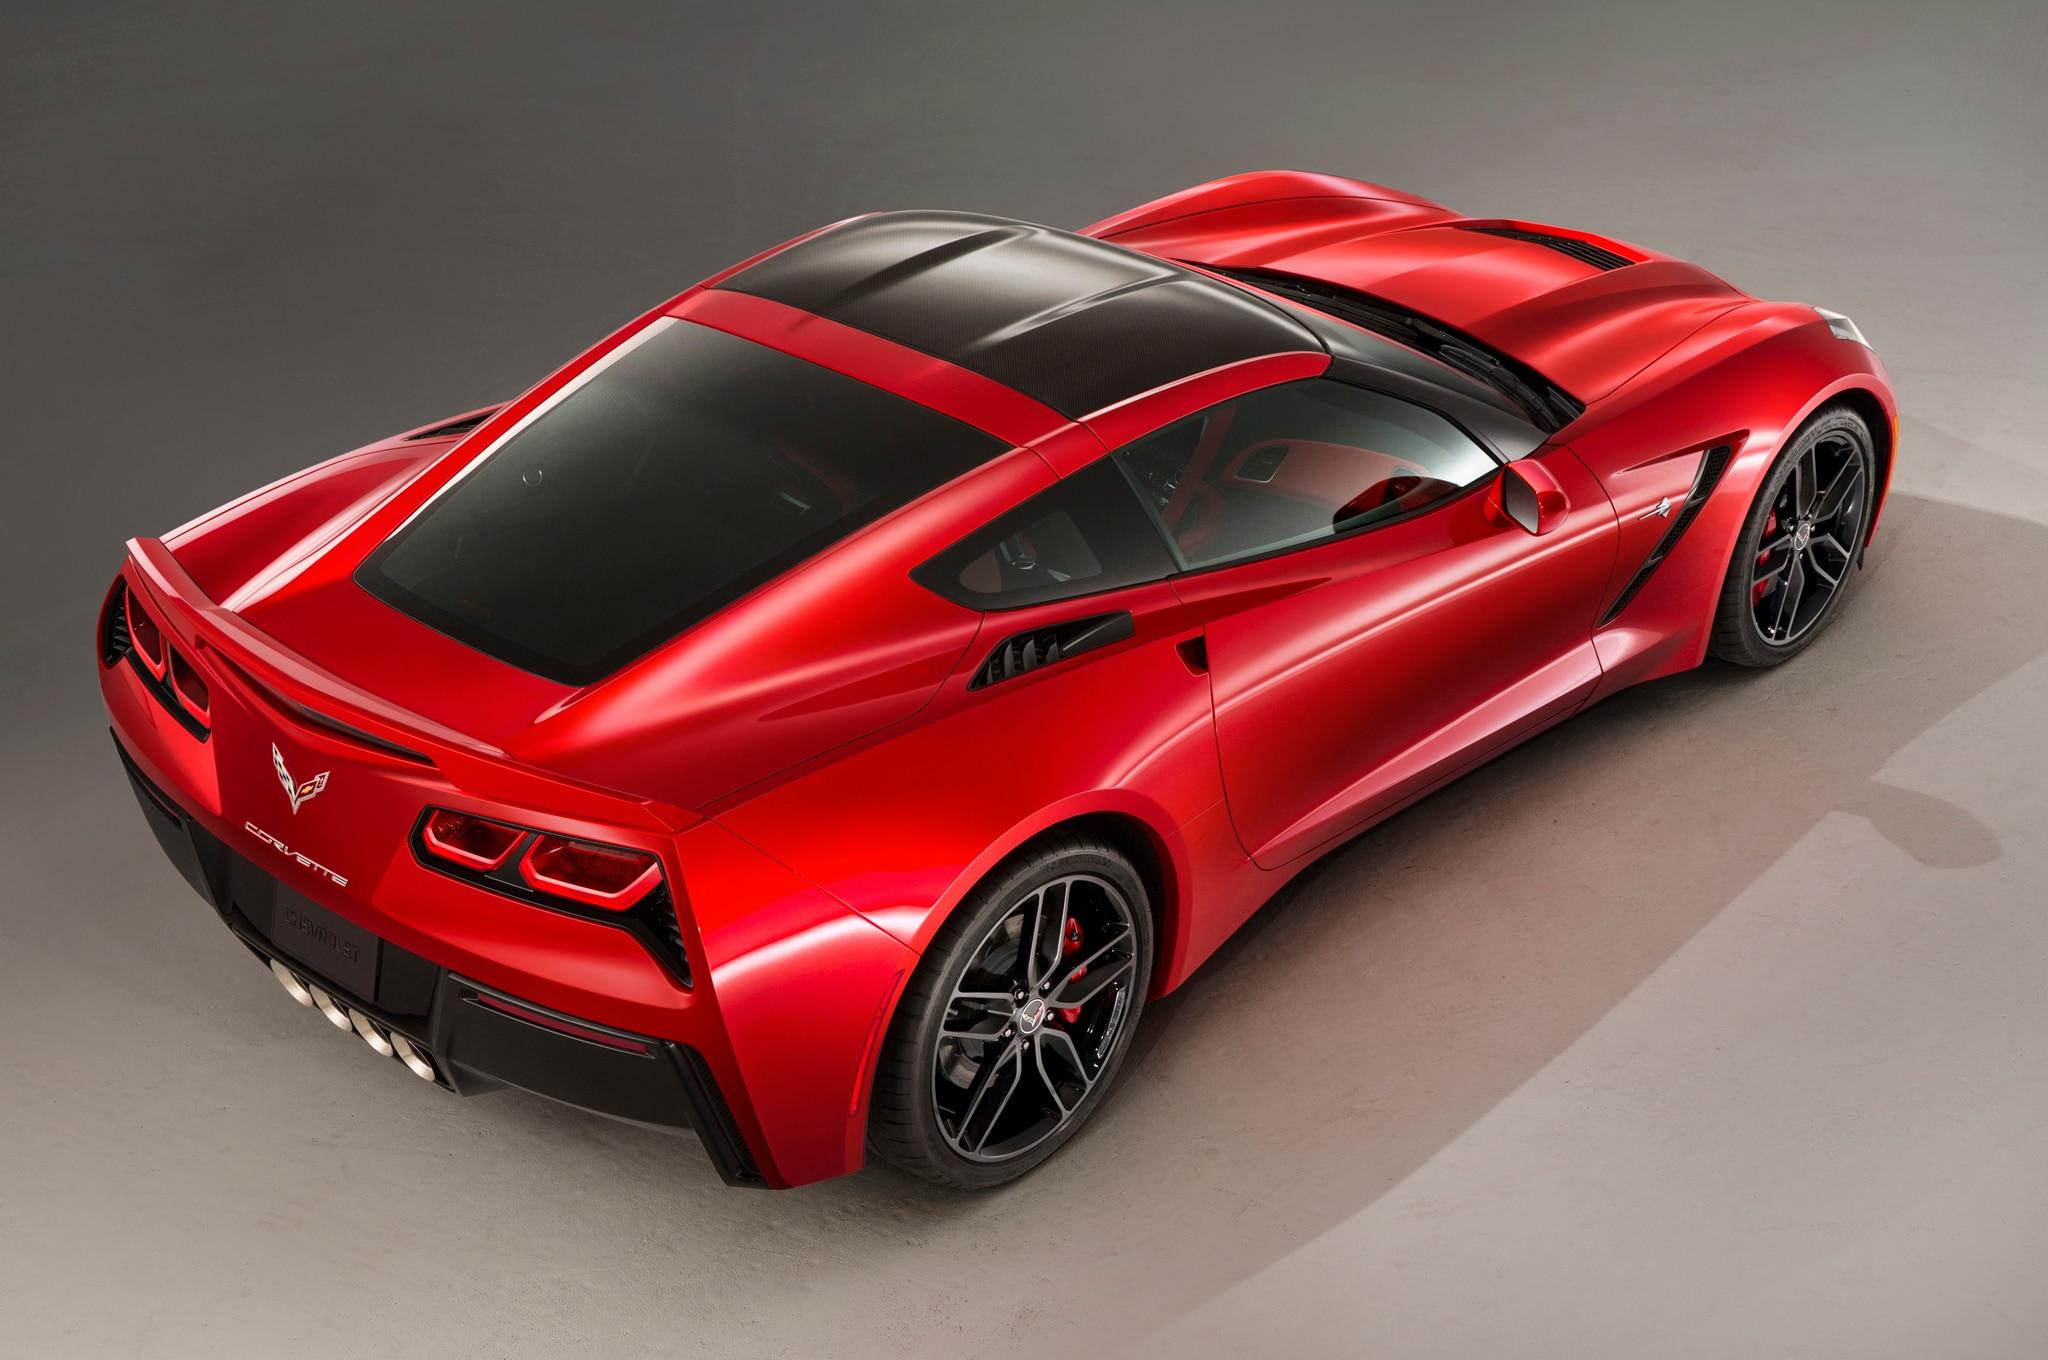 2014 Corvette Rear1